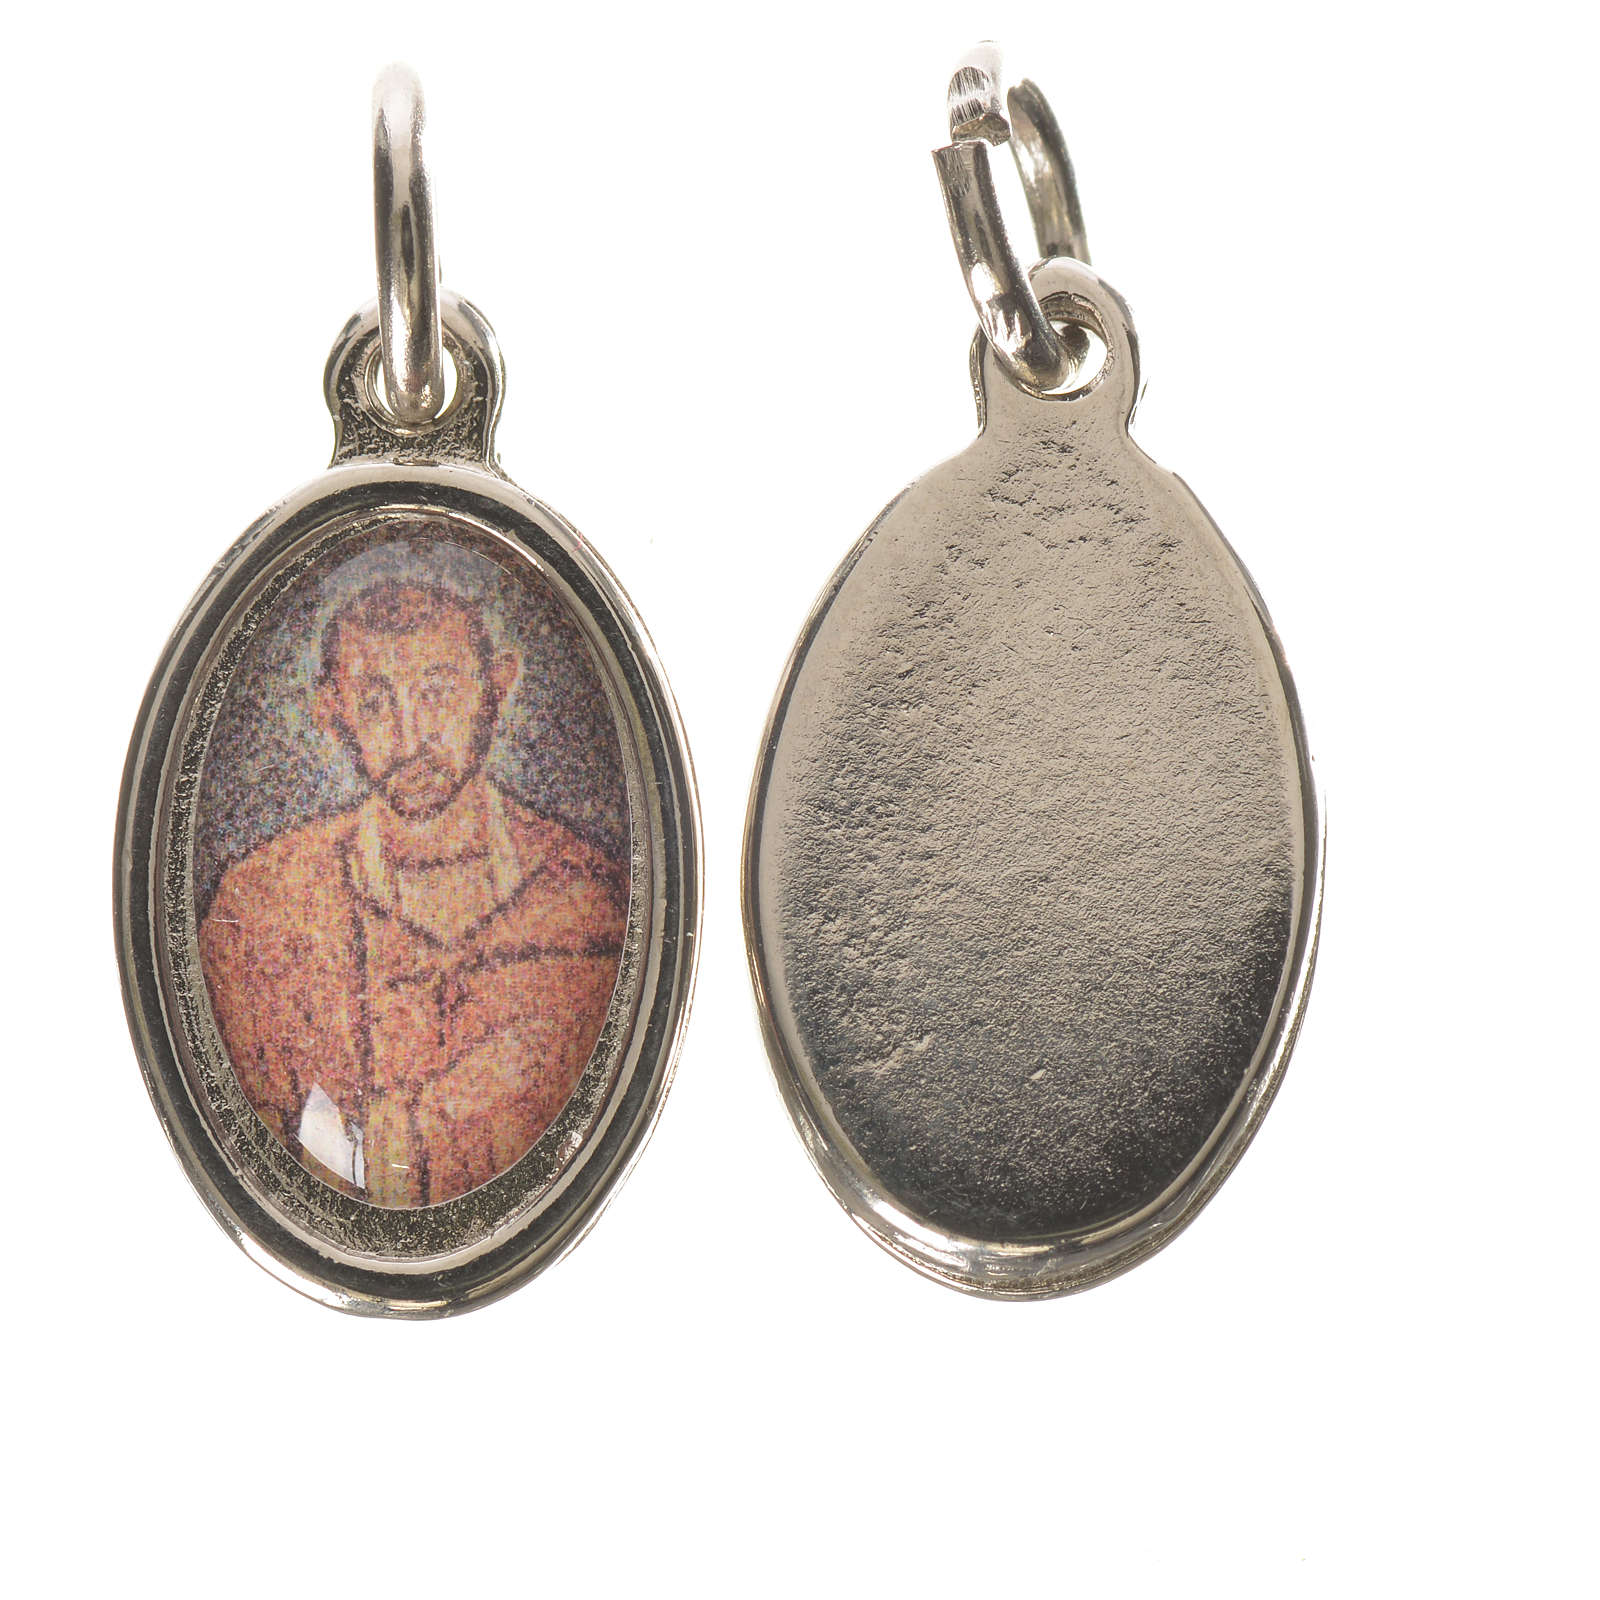 Medaglia S. Ambrogio metallo argentato 1,5cm 4